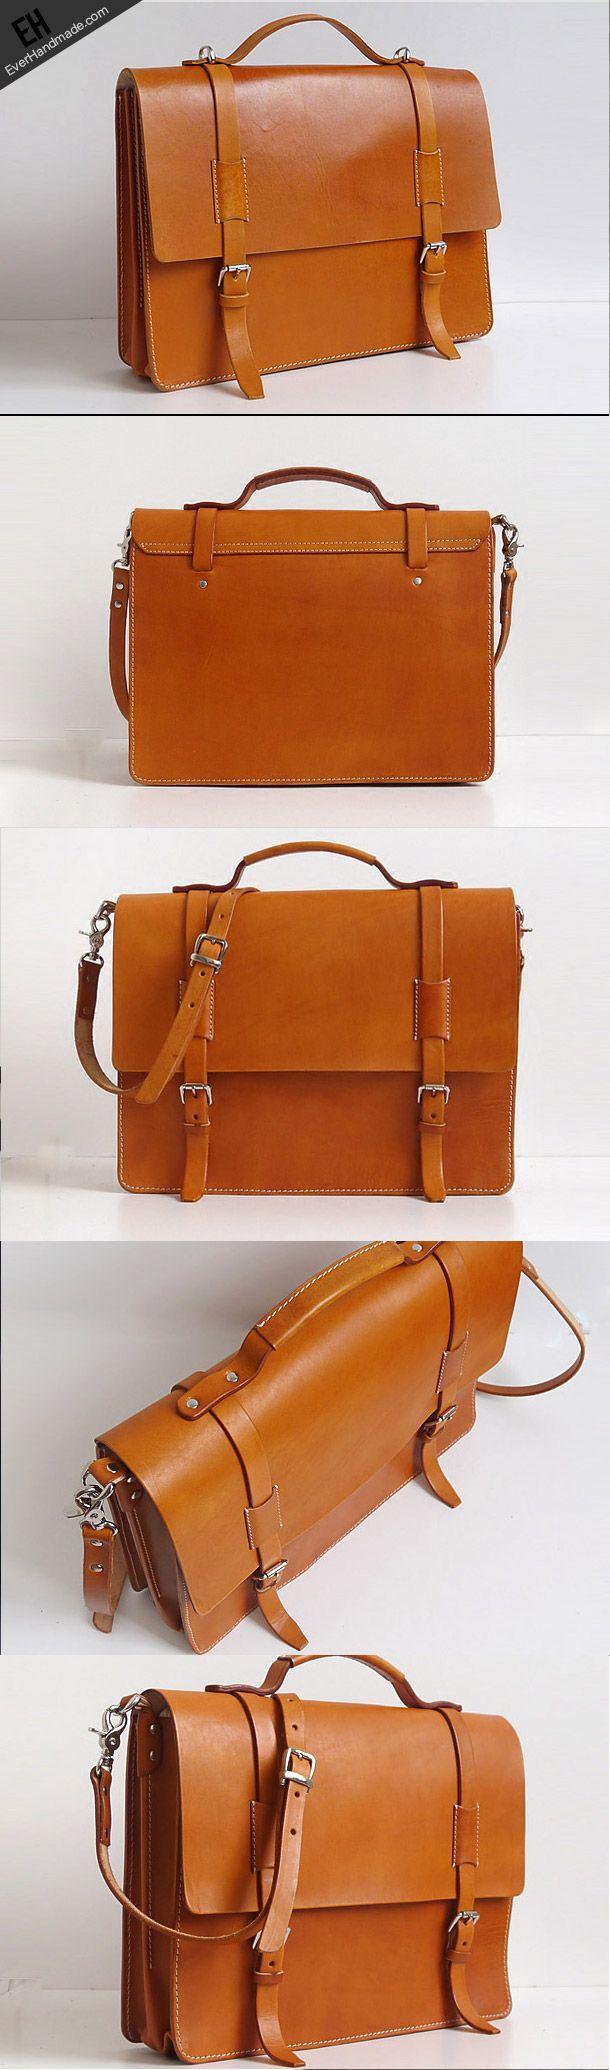 Handmade Leather messenger bag brief yellow brown for men women leather shoulder bag